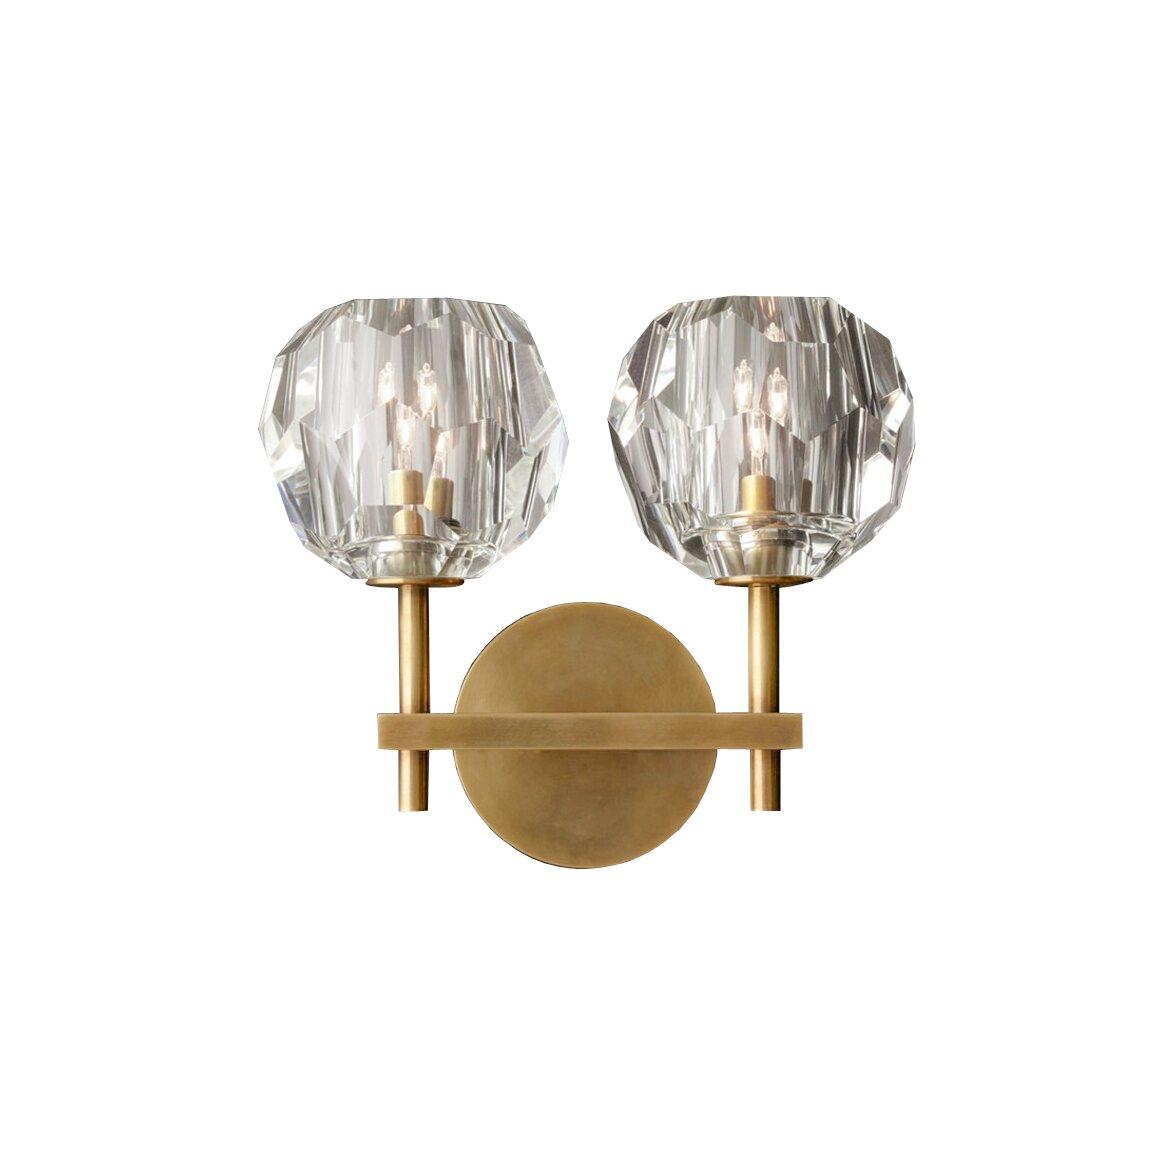 Светильник (бра) Boule de cristal wall | Бра Kingsby